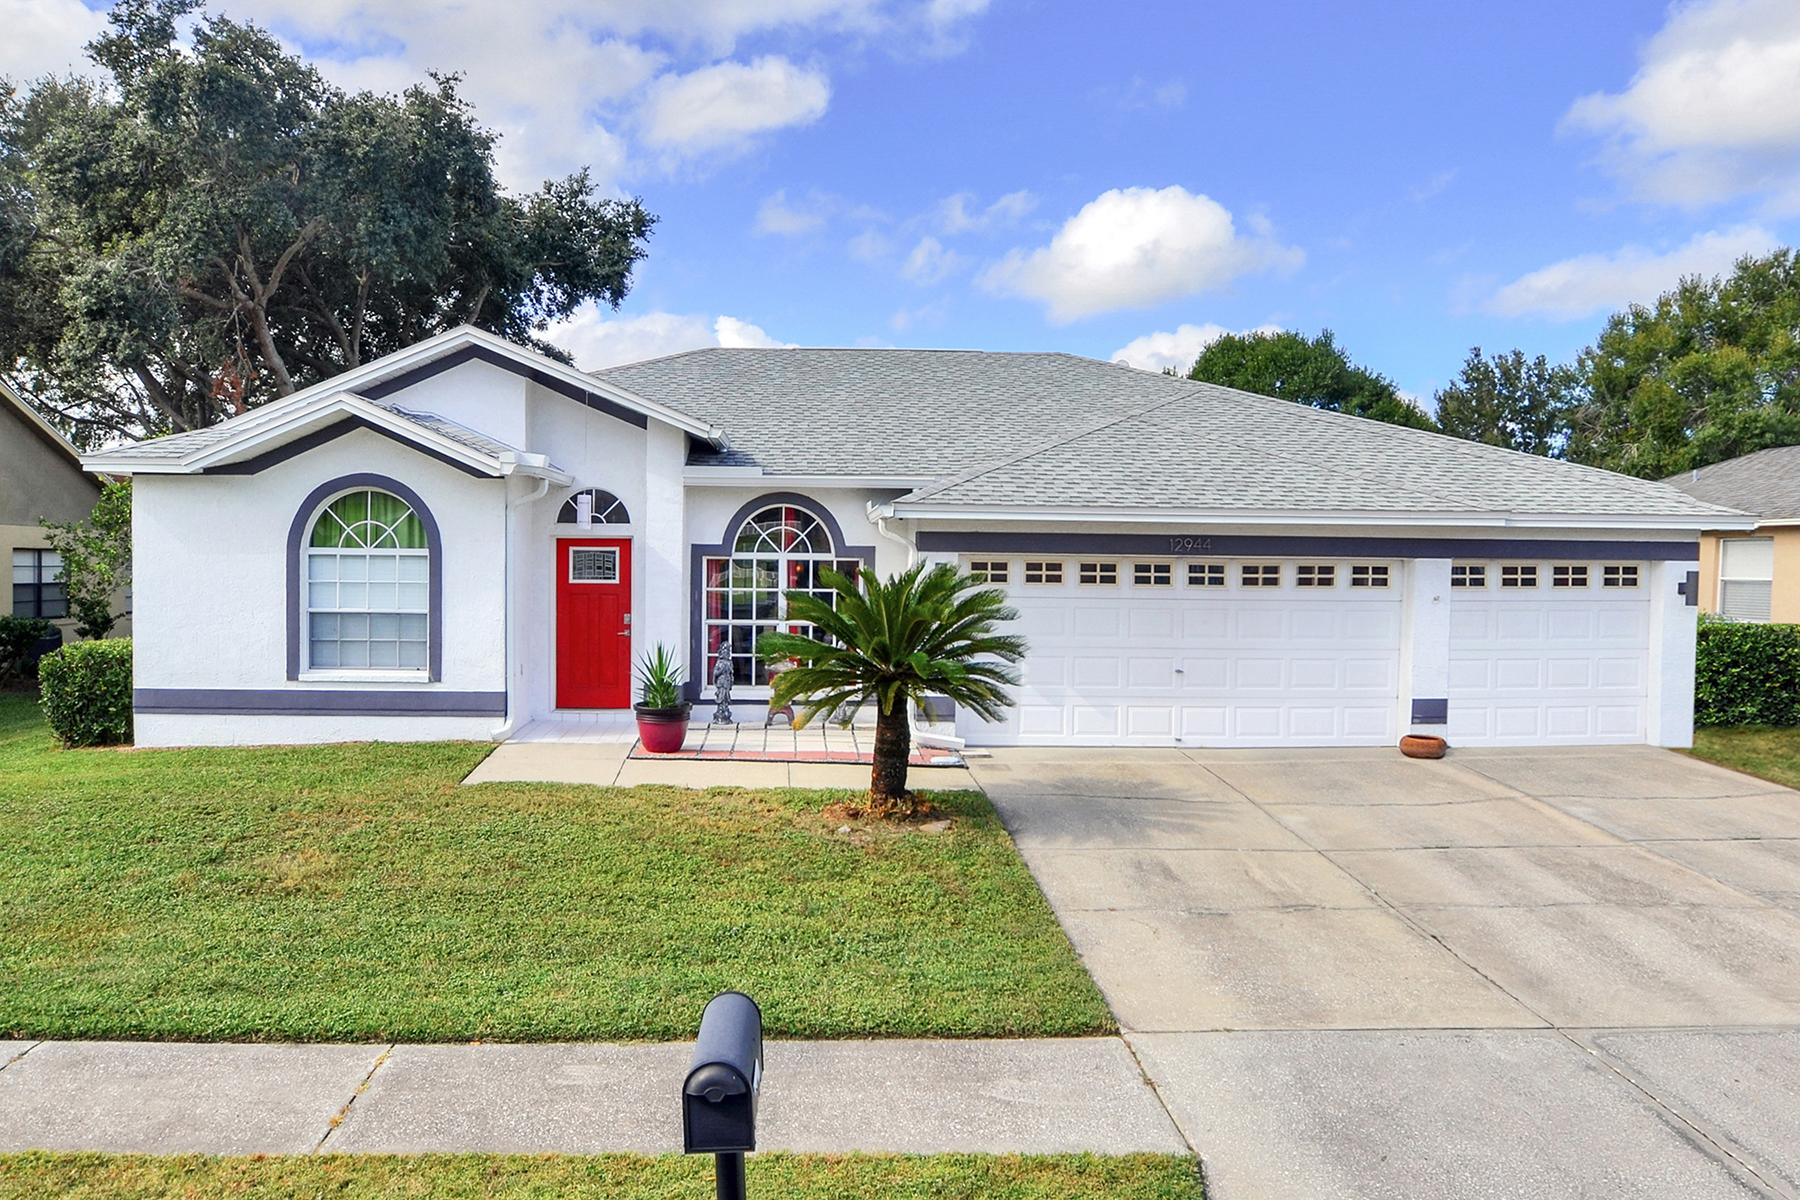 Single Family Homes için Satış at RIVERVIEW 12944 Prestwick Dr, Riverview, Florida 33579 Amerika Birleşik Devletleri